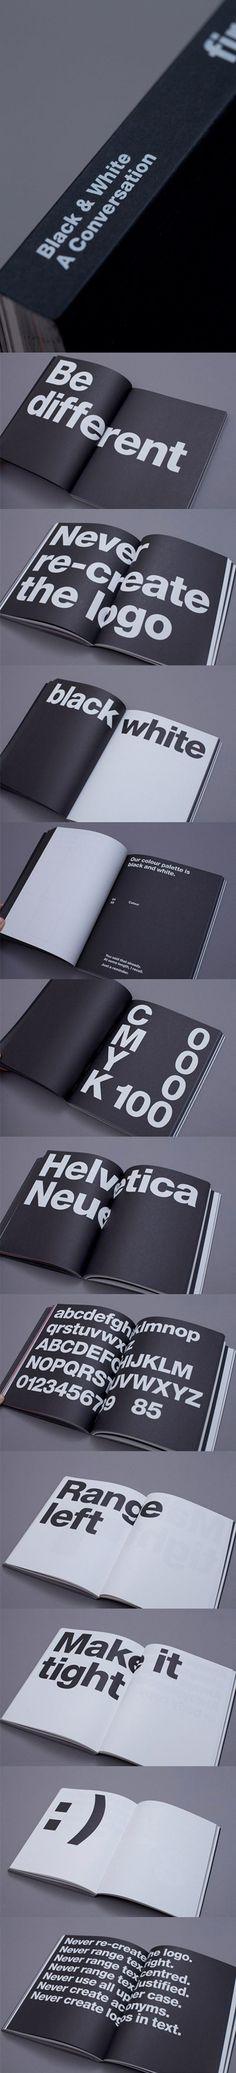 "First Firect - Brand Guidelines ""A Black & White Conversation"" via http://andrewlloydjones.com/first-direct-branding/ #Branding"